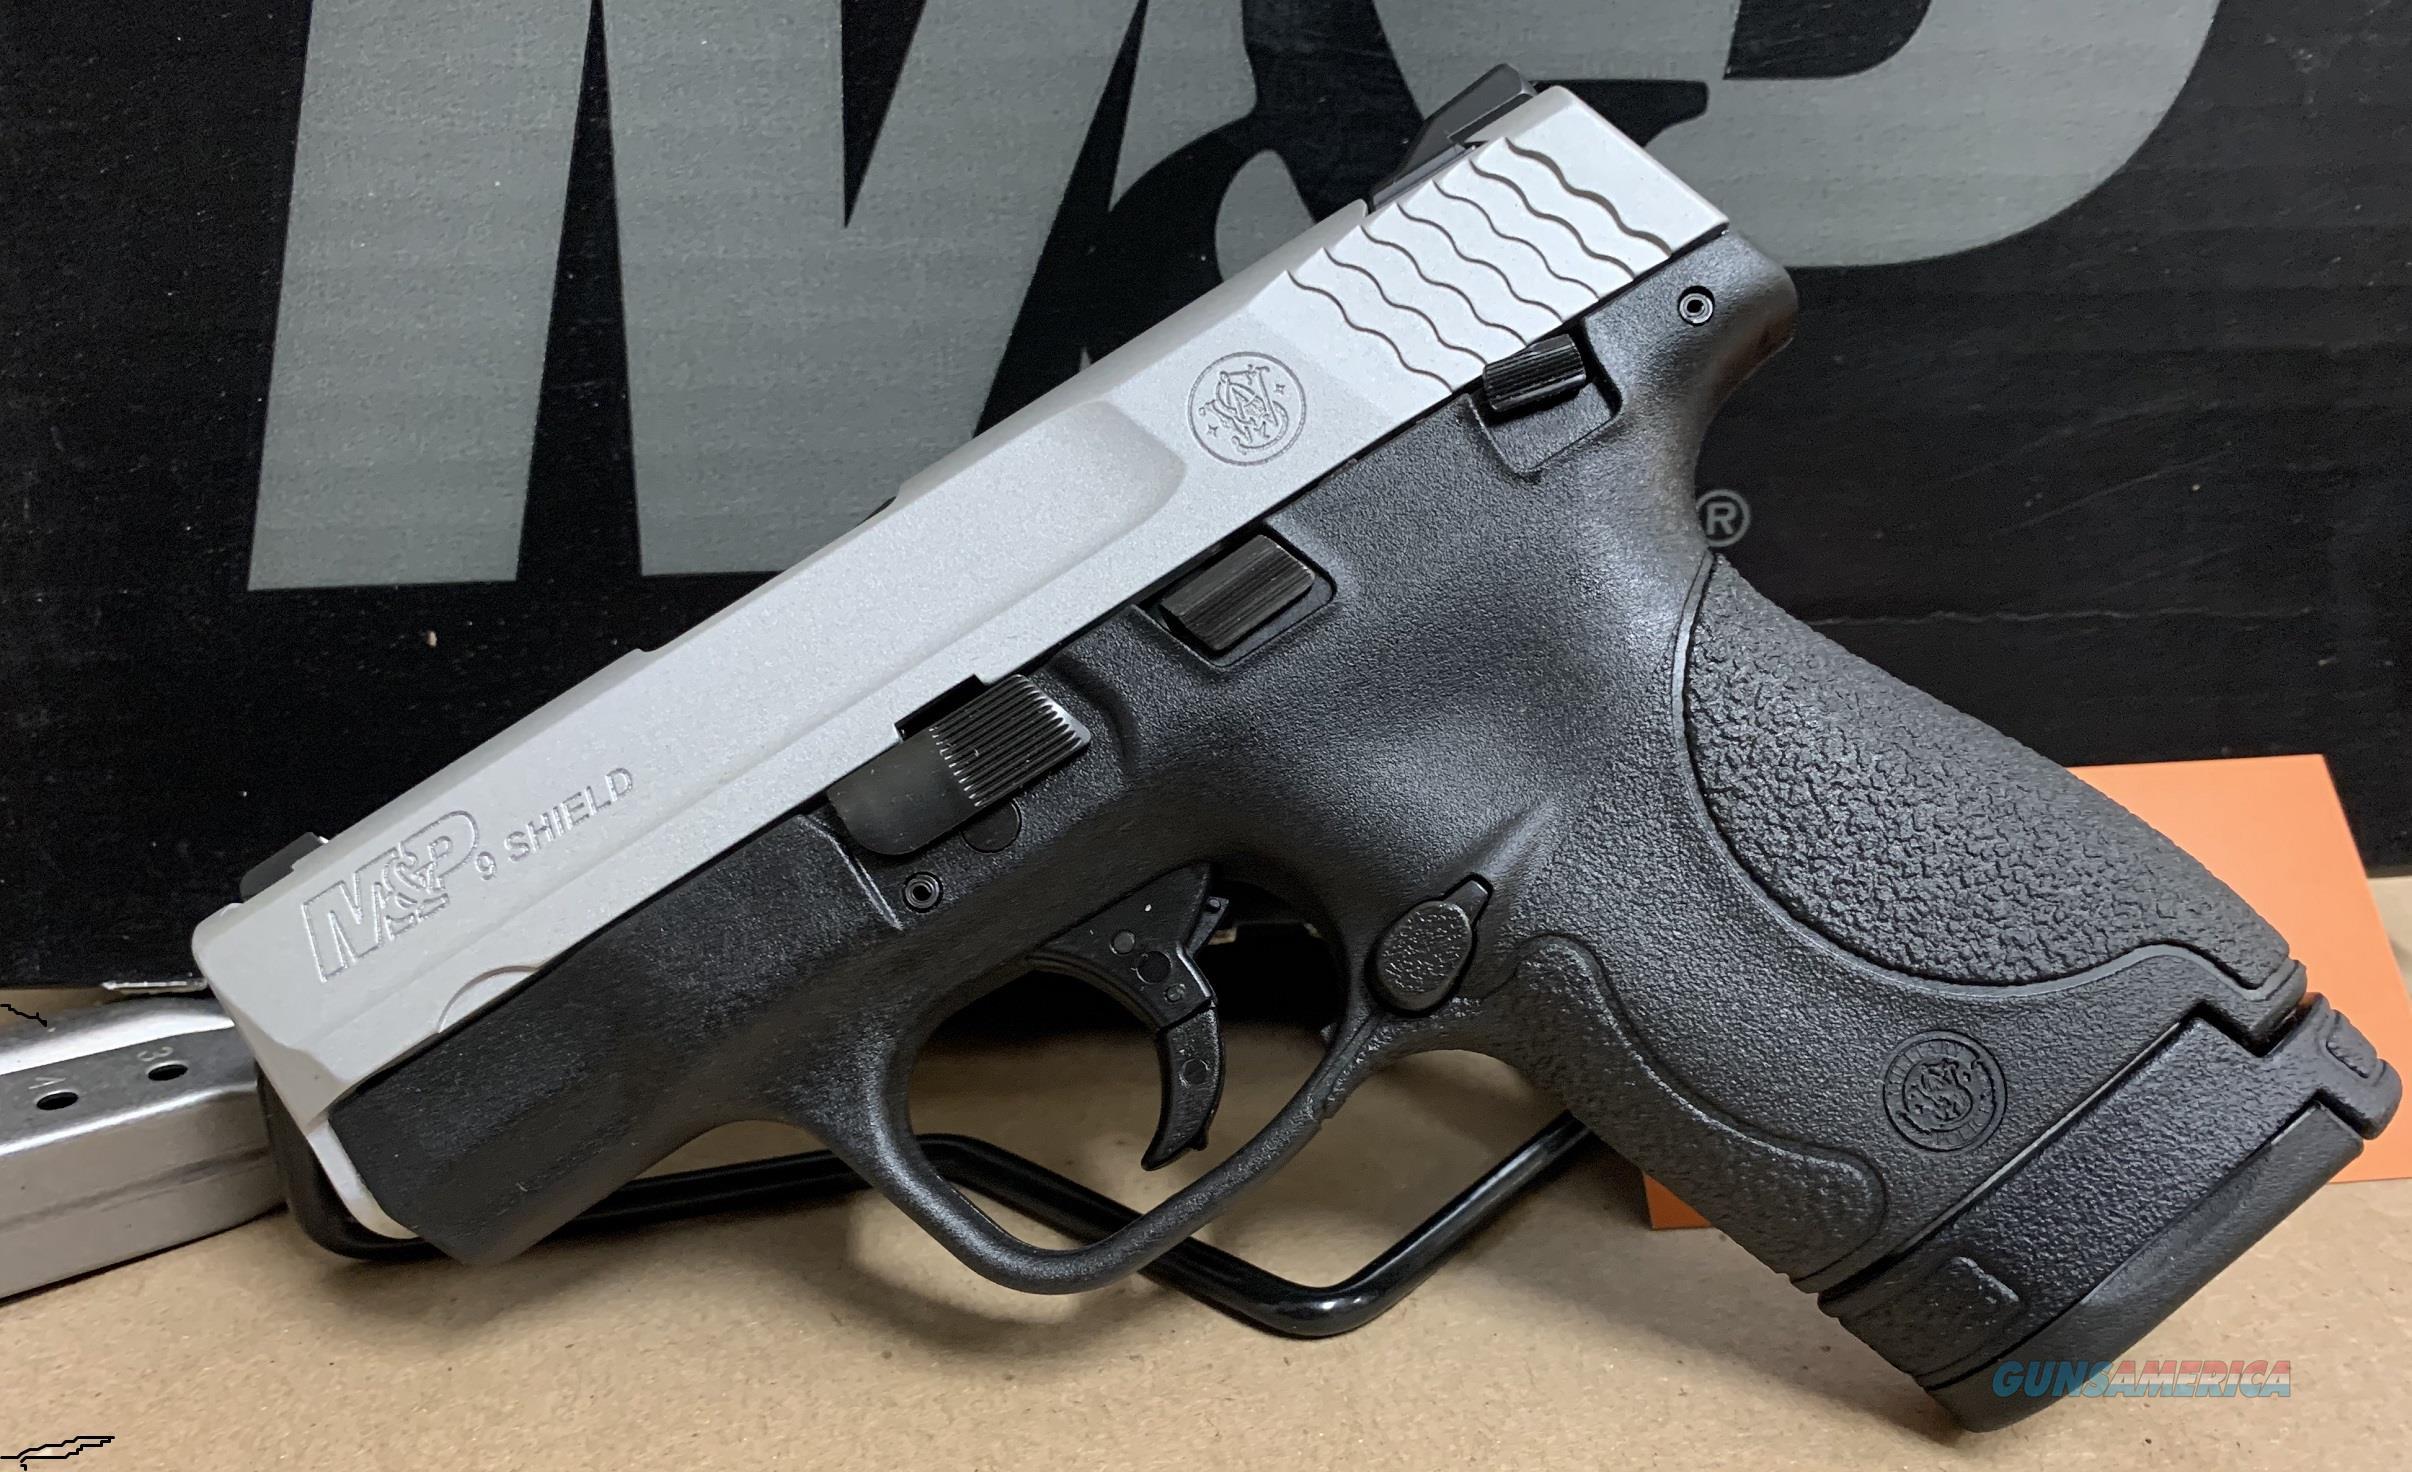 Smith & Wesson M&P 9 Shield 13219 9mm 7+1 8+1 Mags Satin Aluminum Cerakote *NO CREDIT CARD FEE*  Guns > Pistols > Smith & Wesson Pistols - Autos > Shield